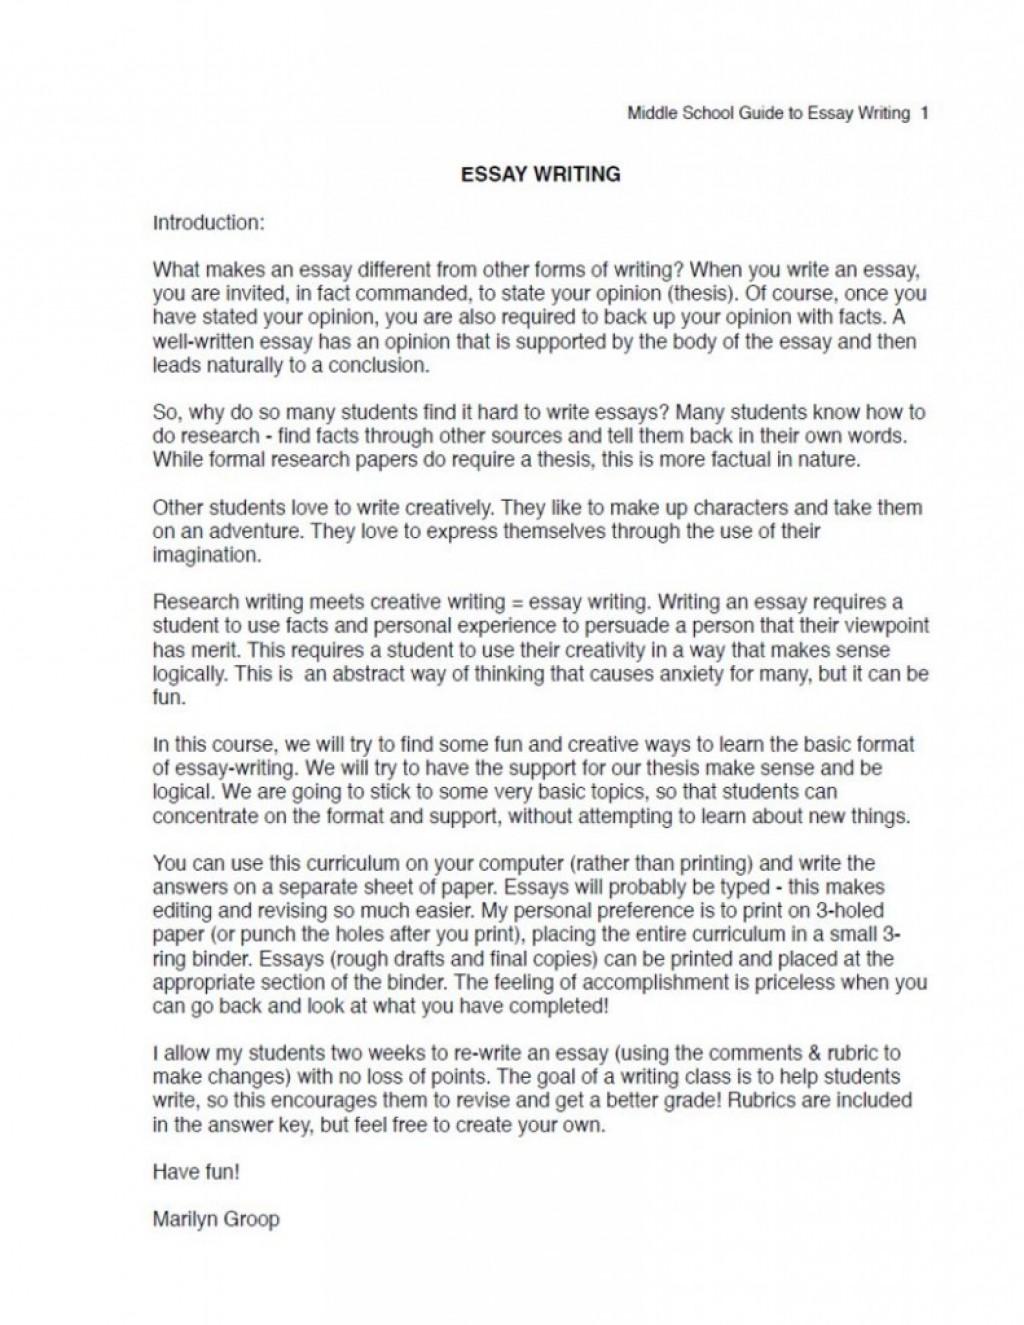 011 Essay Example School Uniform Ms Excerpt Sensational Is Compulsory In Hindi Conclusion Large